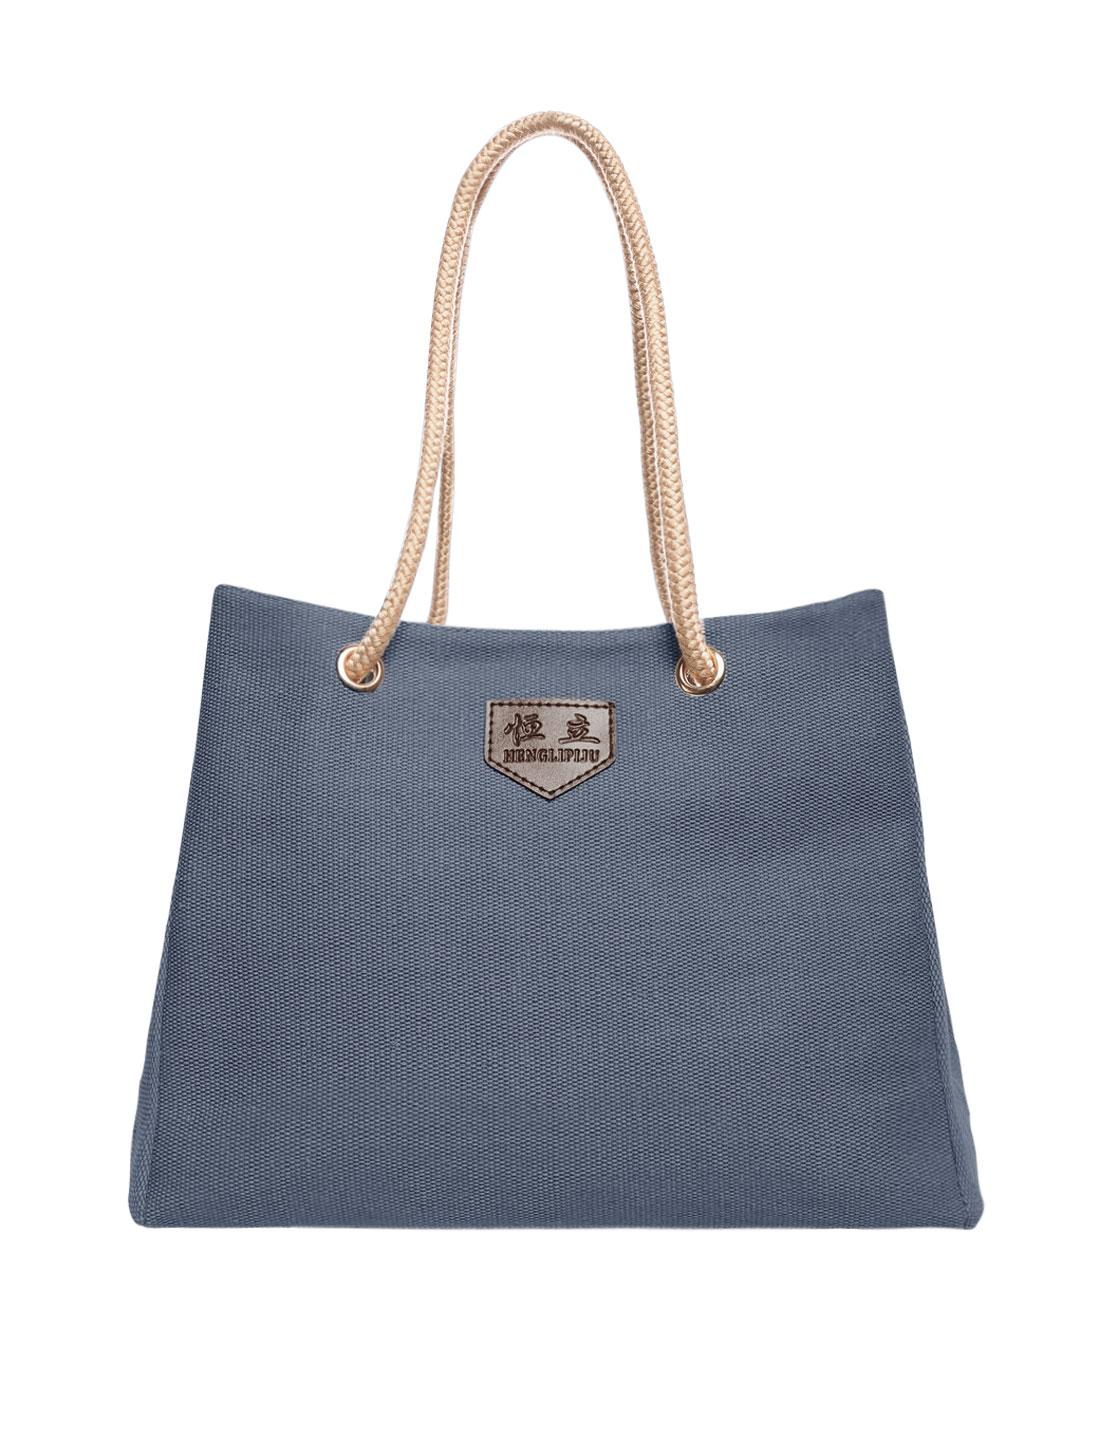 Fashion Women Canvas Shoulder Bag Messenger Shopping Satchel Tote Handbag Blue